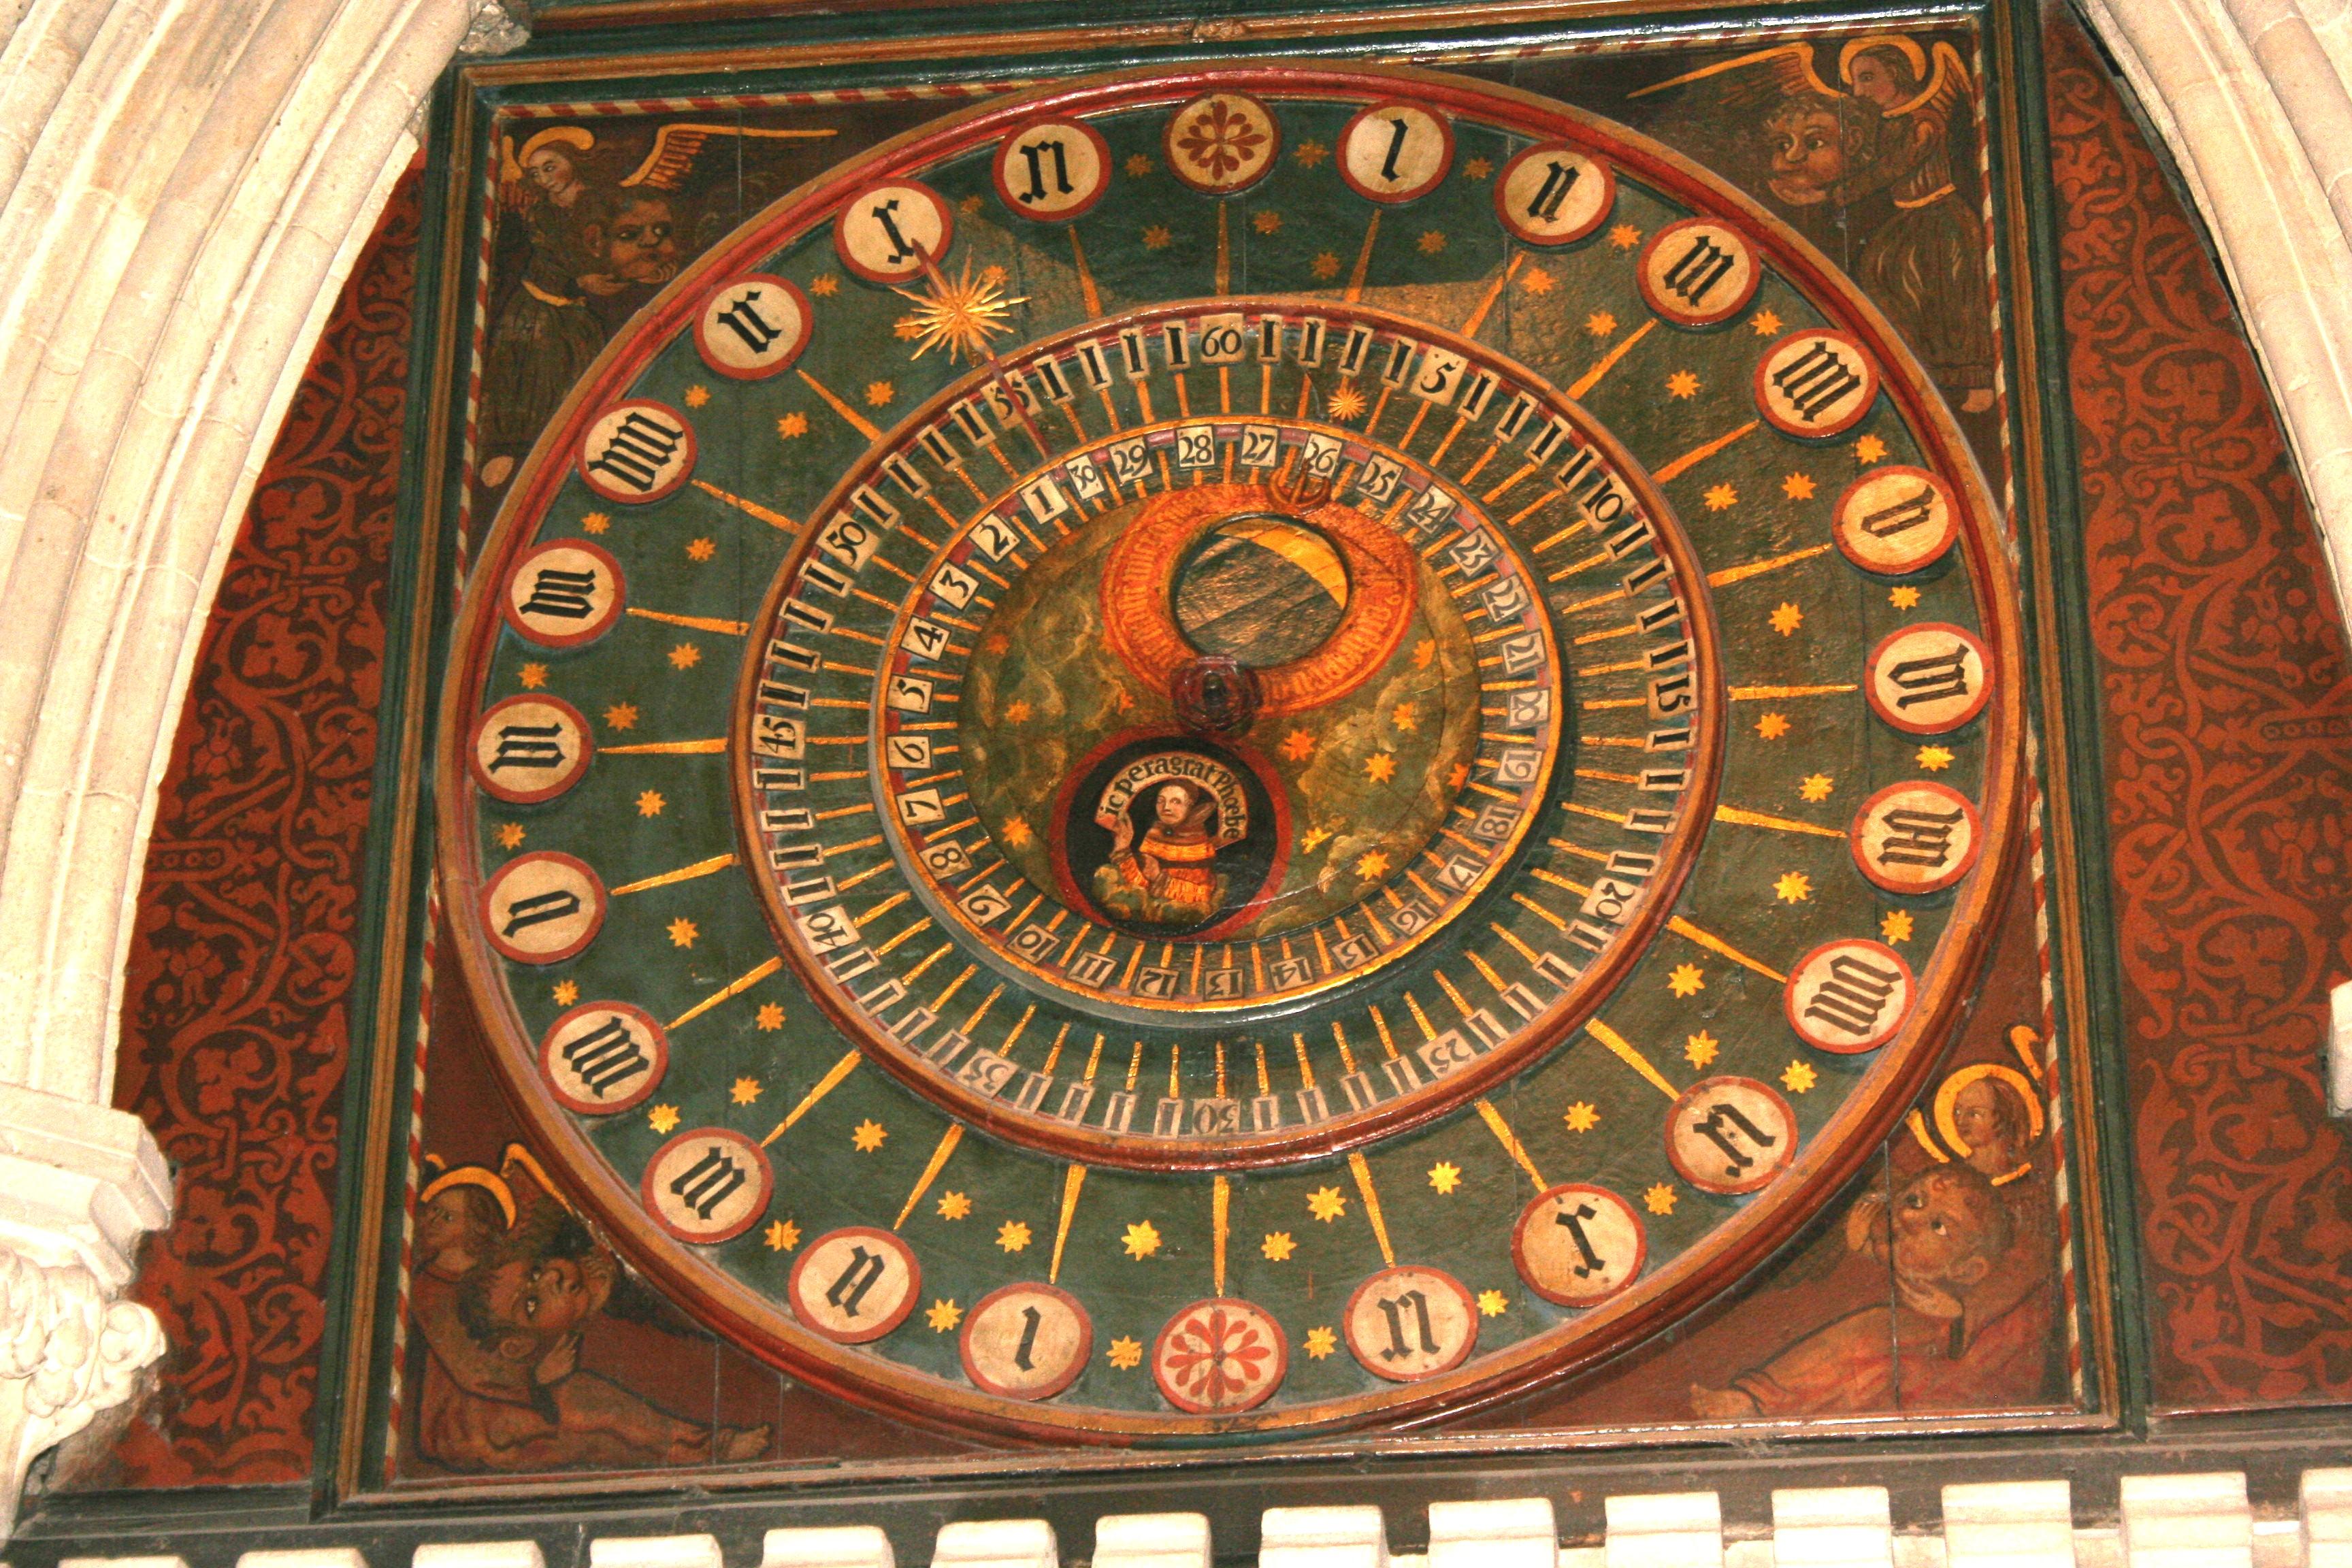 Original Clock in Wells Cathedral